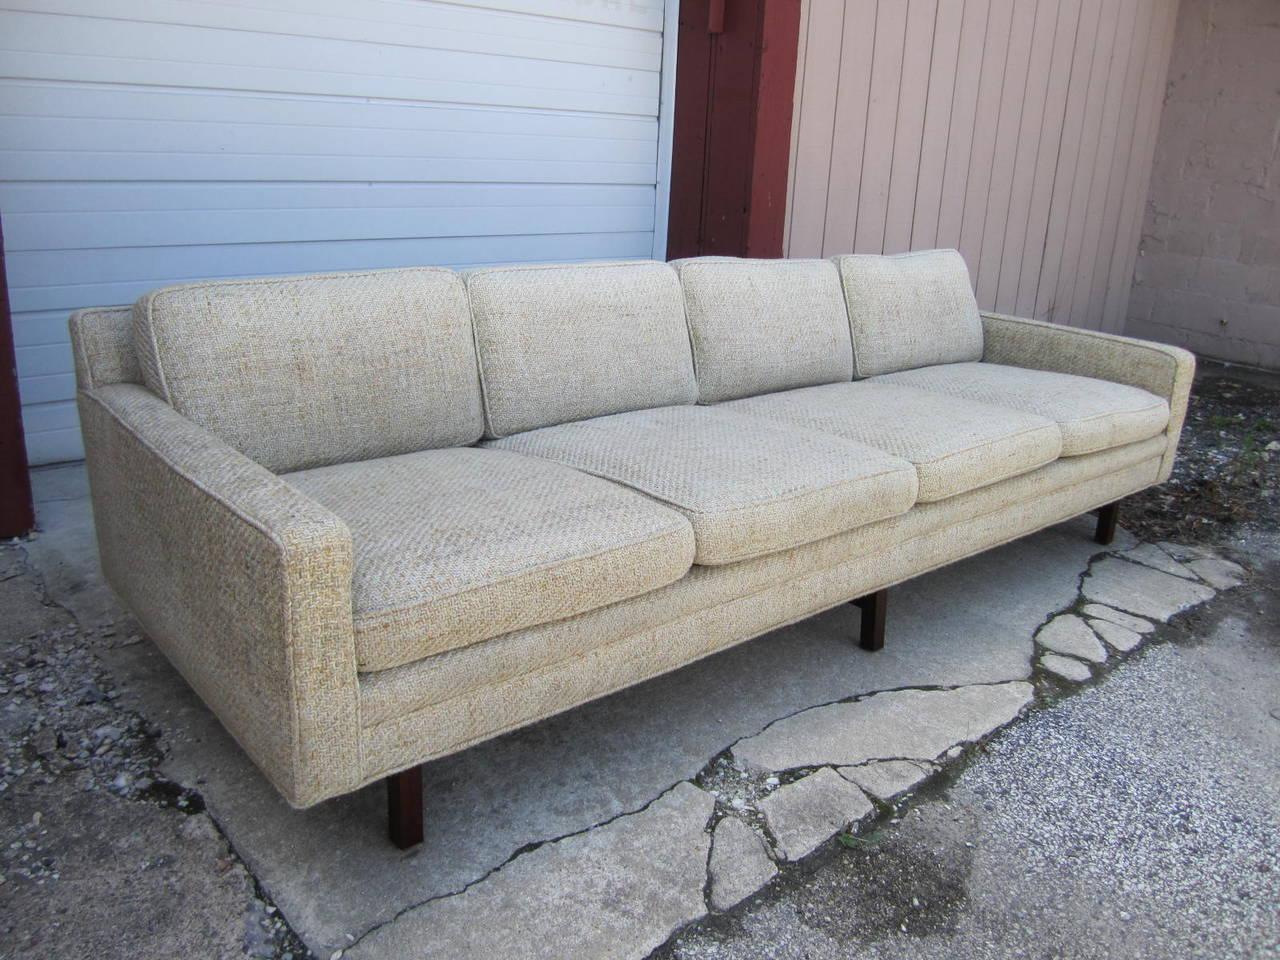 Fabulous Milo Baughman Four Seat Sofa With Walnut Legs